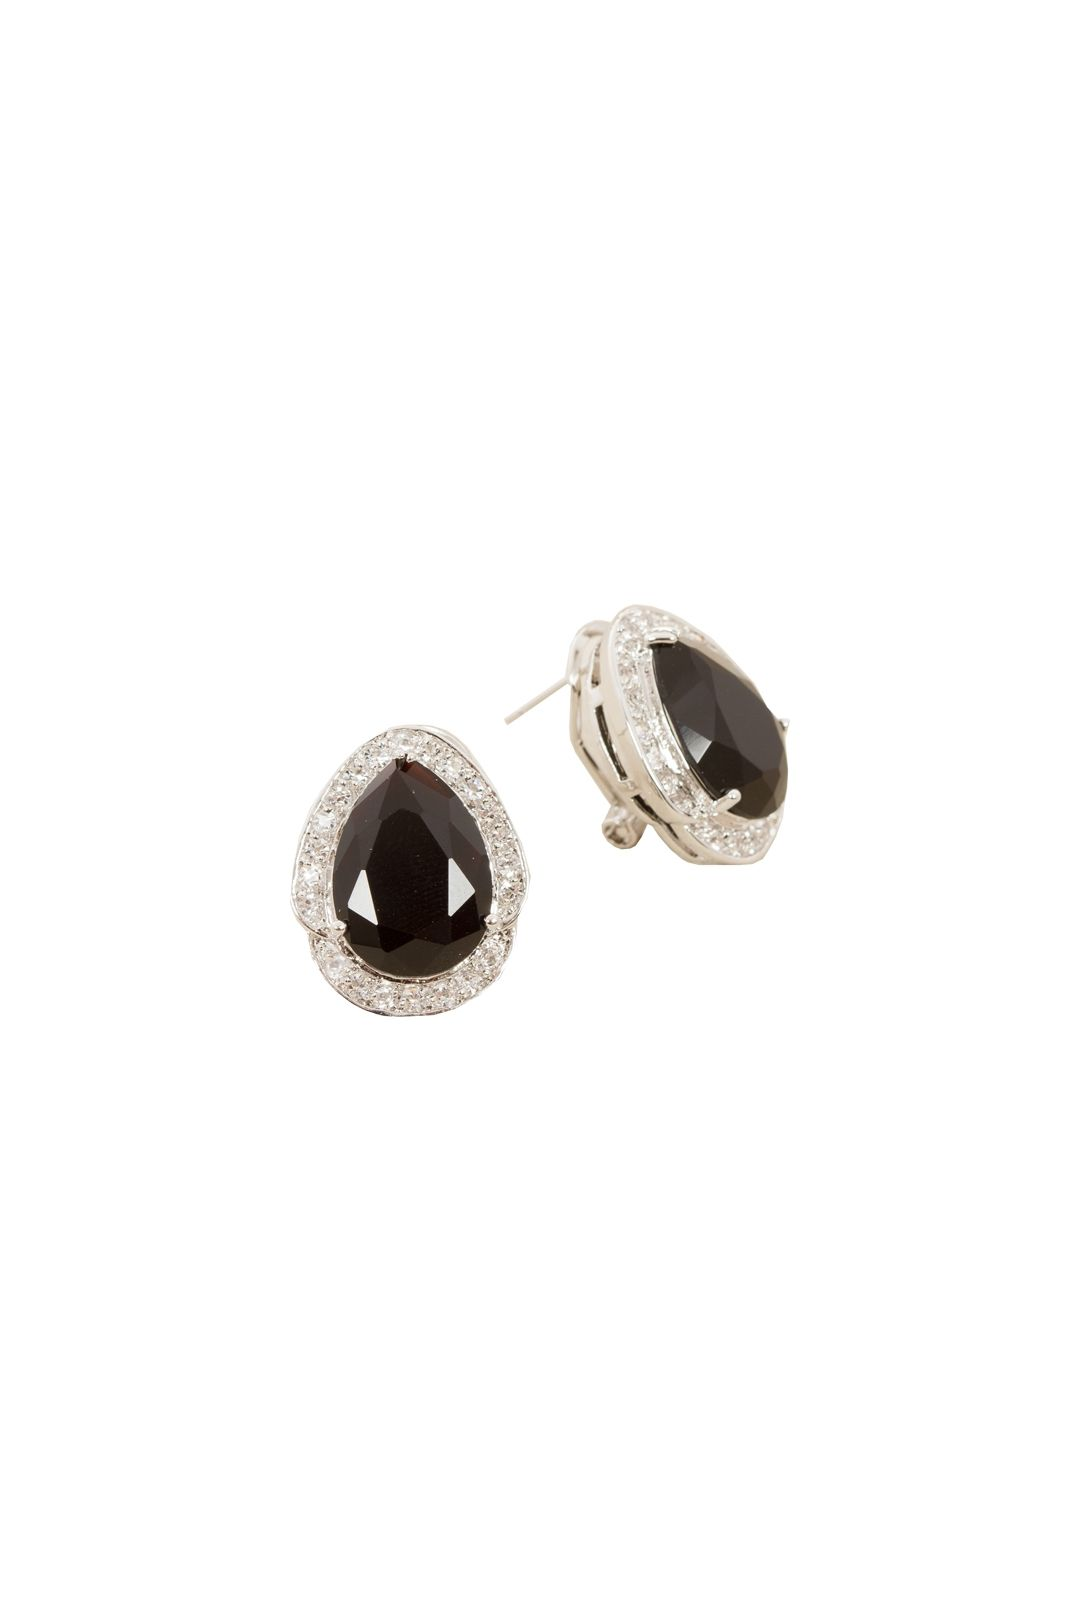 Adorne - Jewel Teardrop Diamante Edge Stud Earring - Silver Black - Front